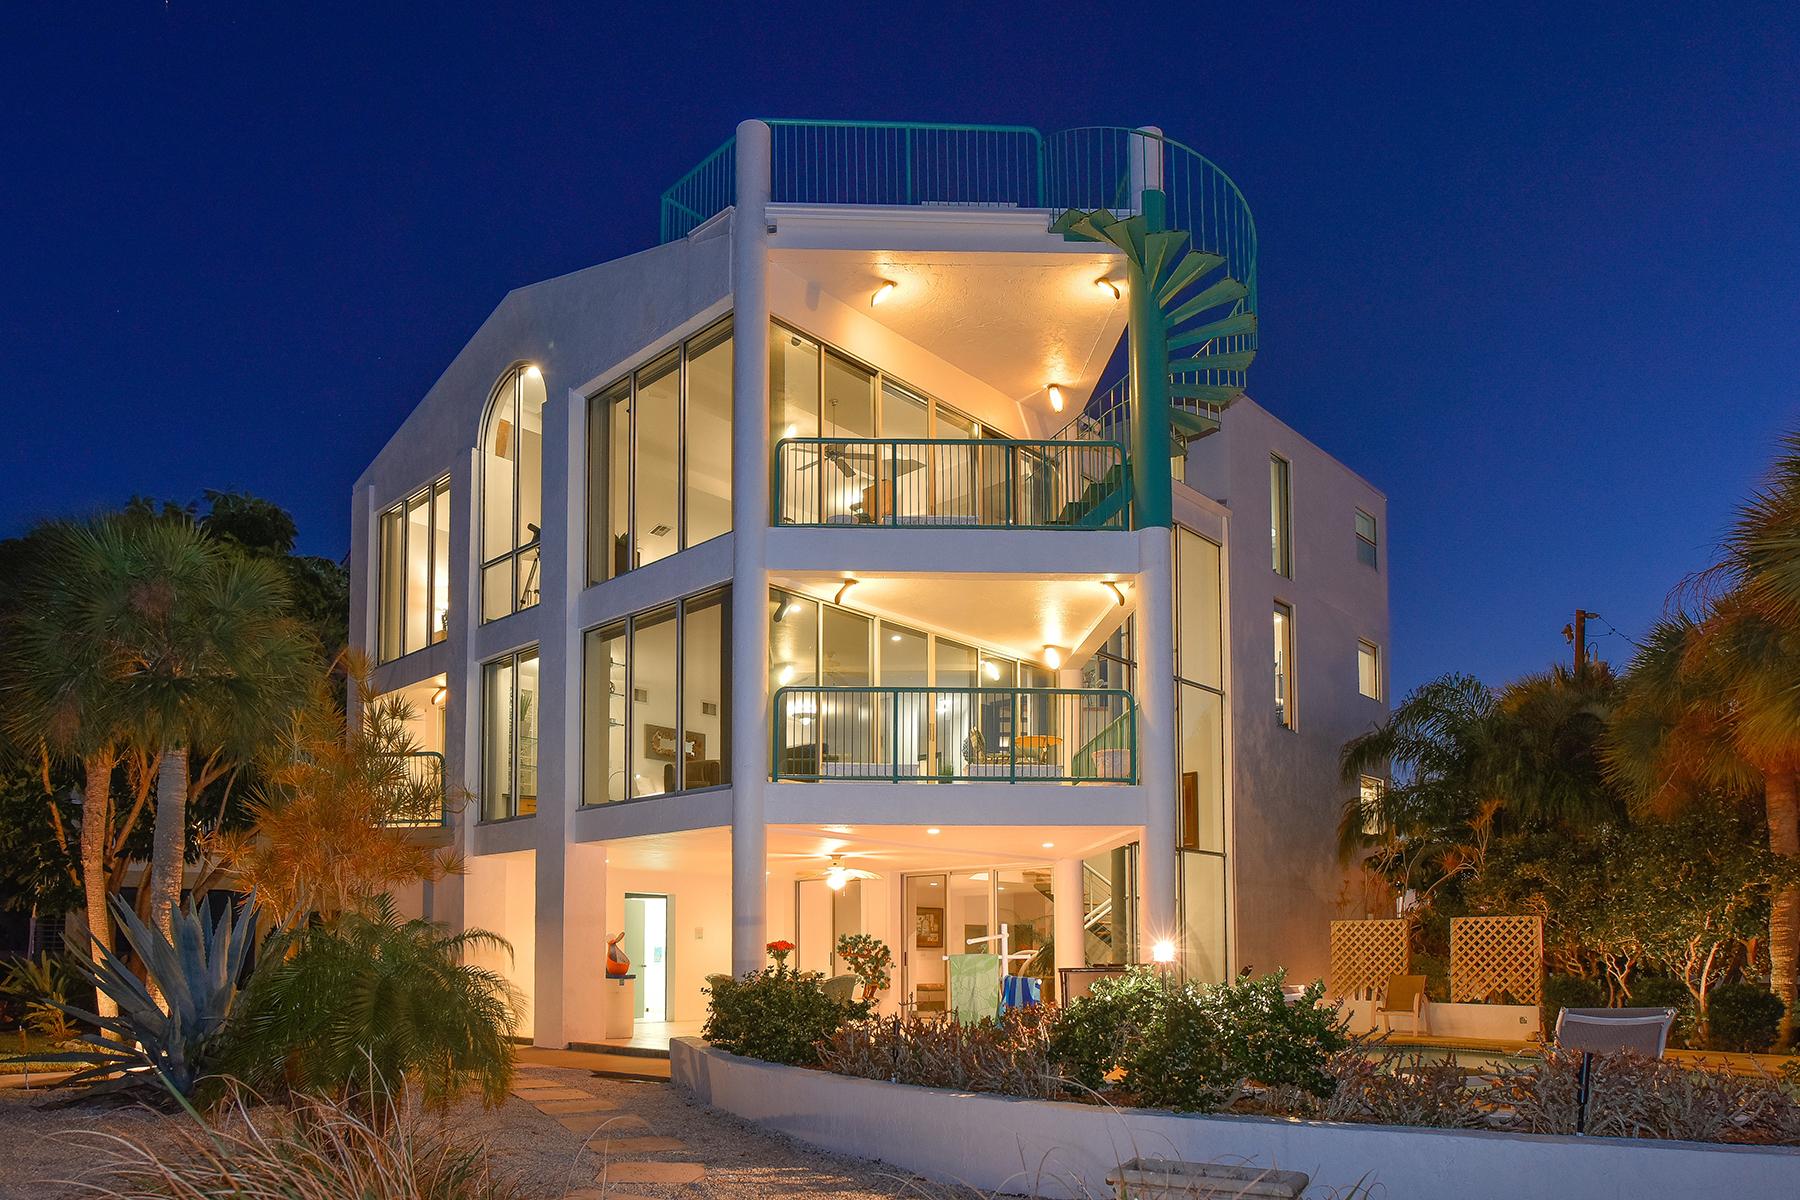 Single Family Home for Sale at LAGUNA PARK - VENICE ISLAND 723 El Dorado Dr Venice, Florida, 34285 United States